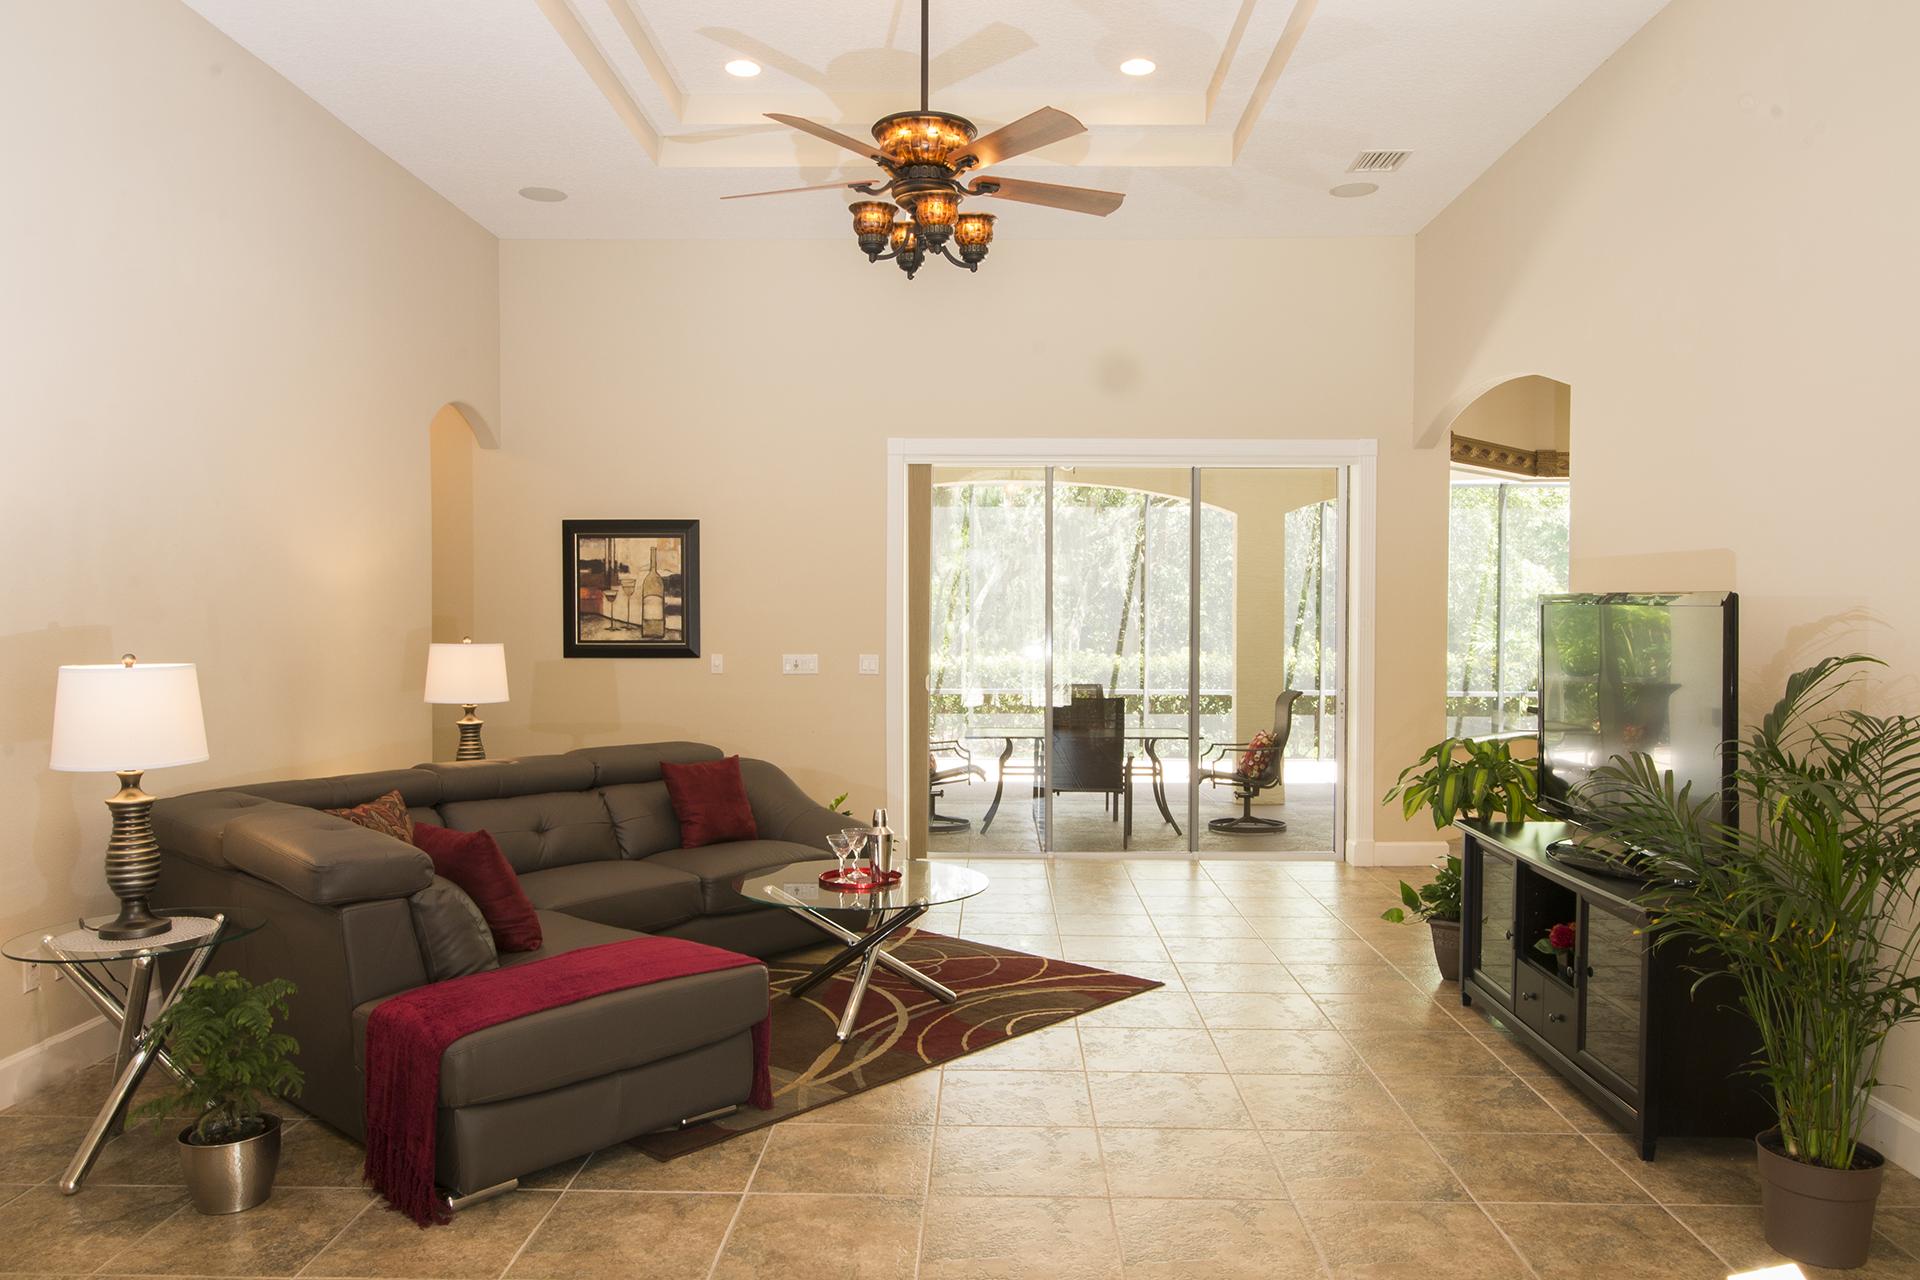 Staged-Assets-Home-Staging-Interior-Design-Palm-Coast-Florida-3